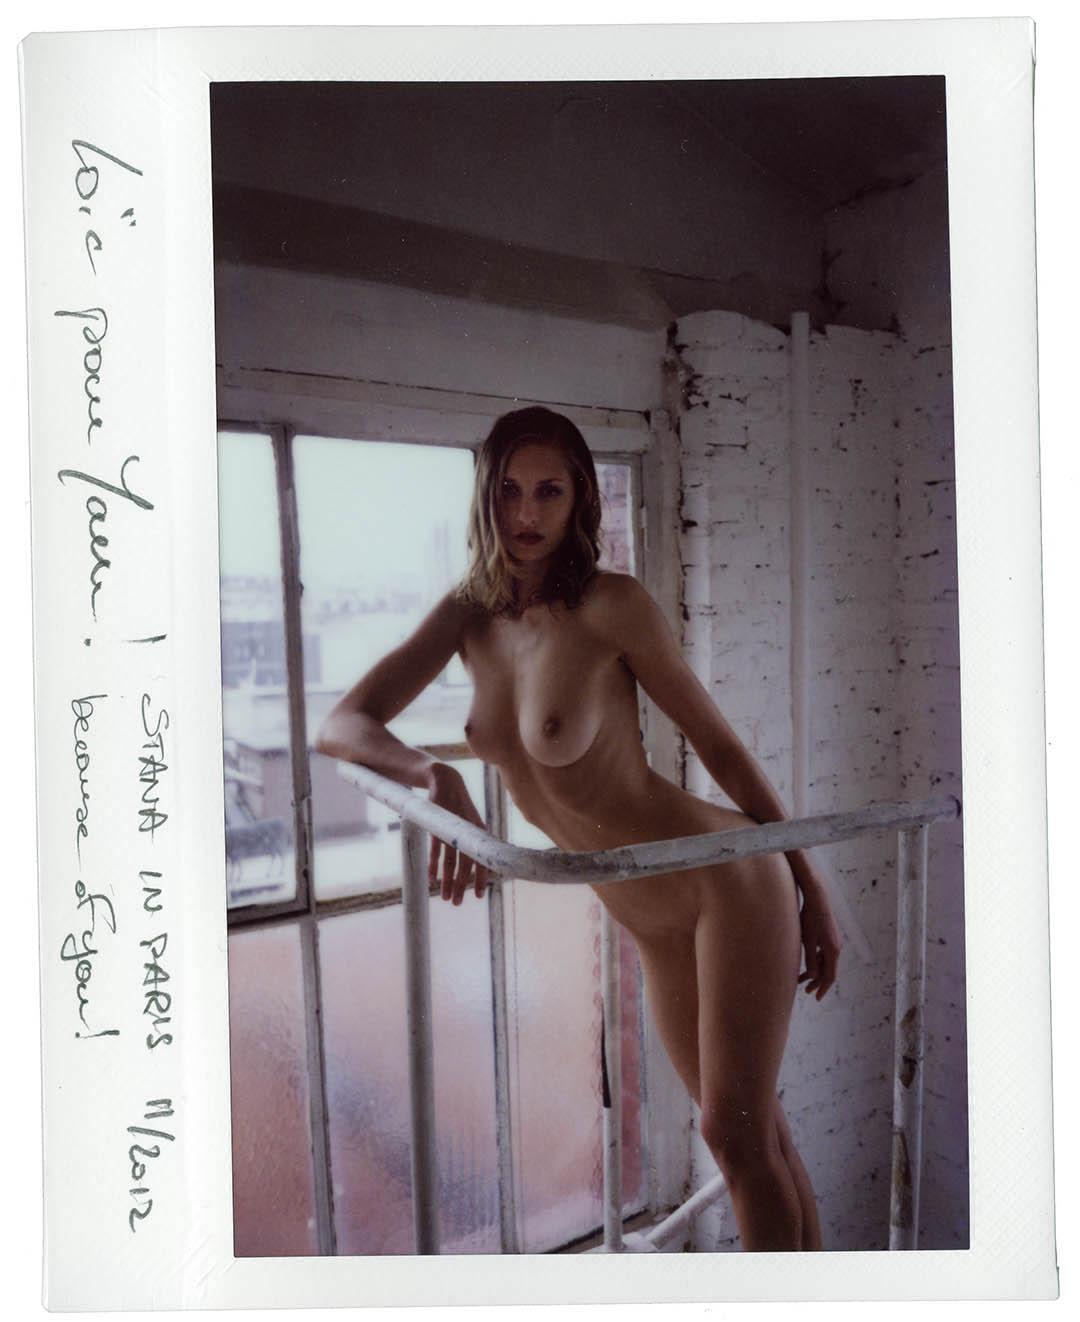 Nude art shooting with playmate Stana K in daylight parisian studio, © Loïc Dorez.